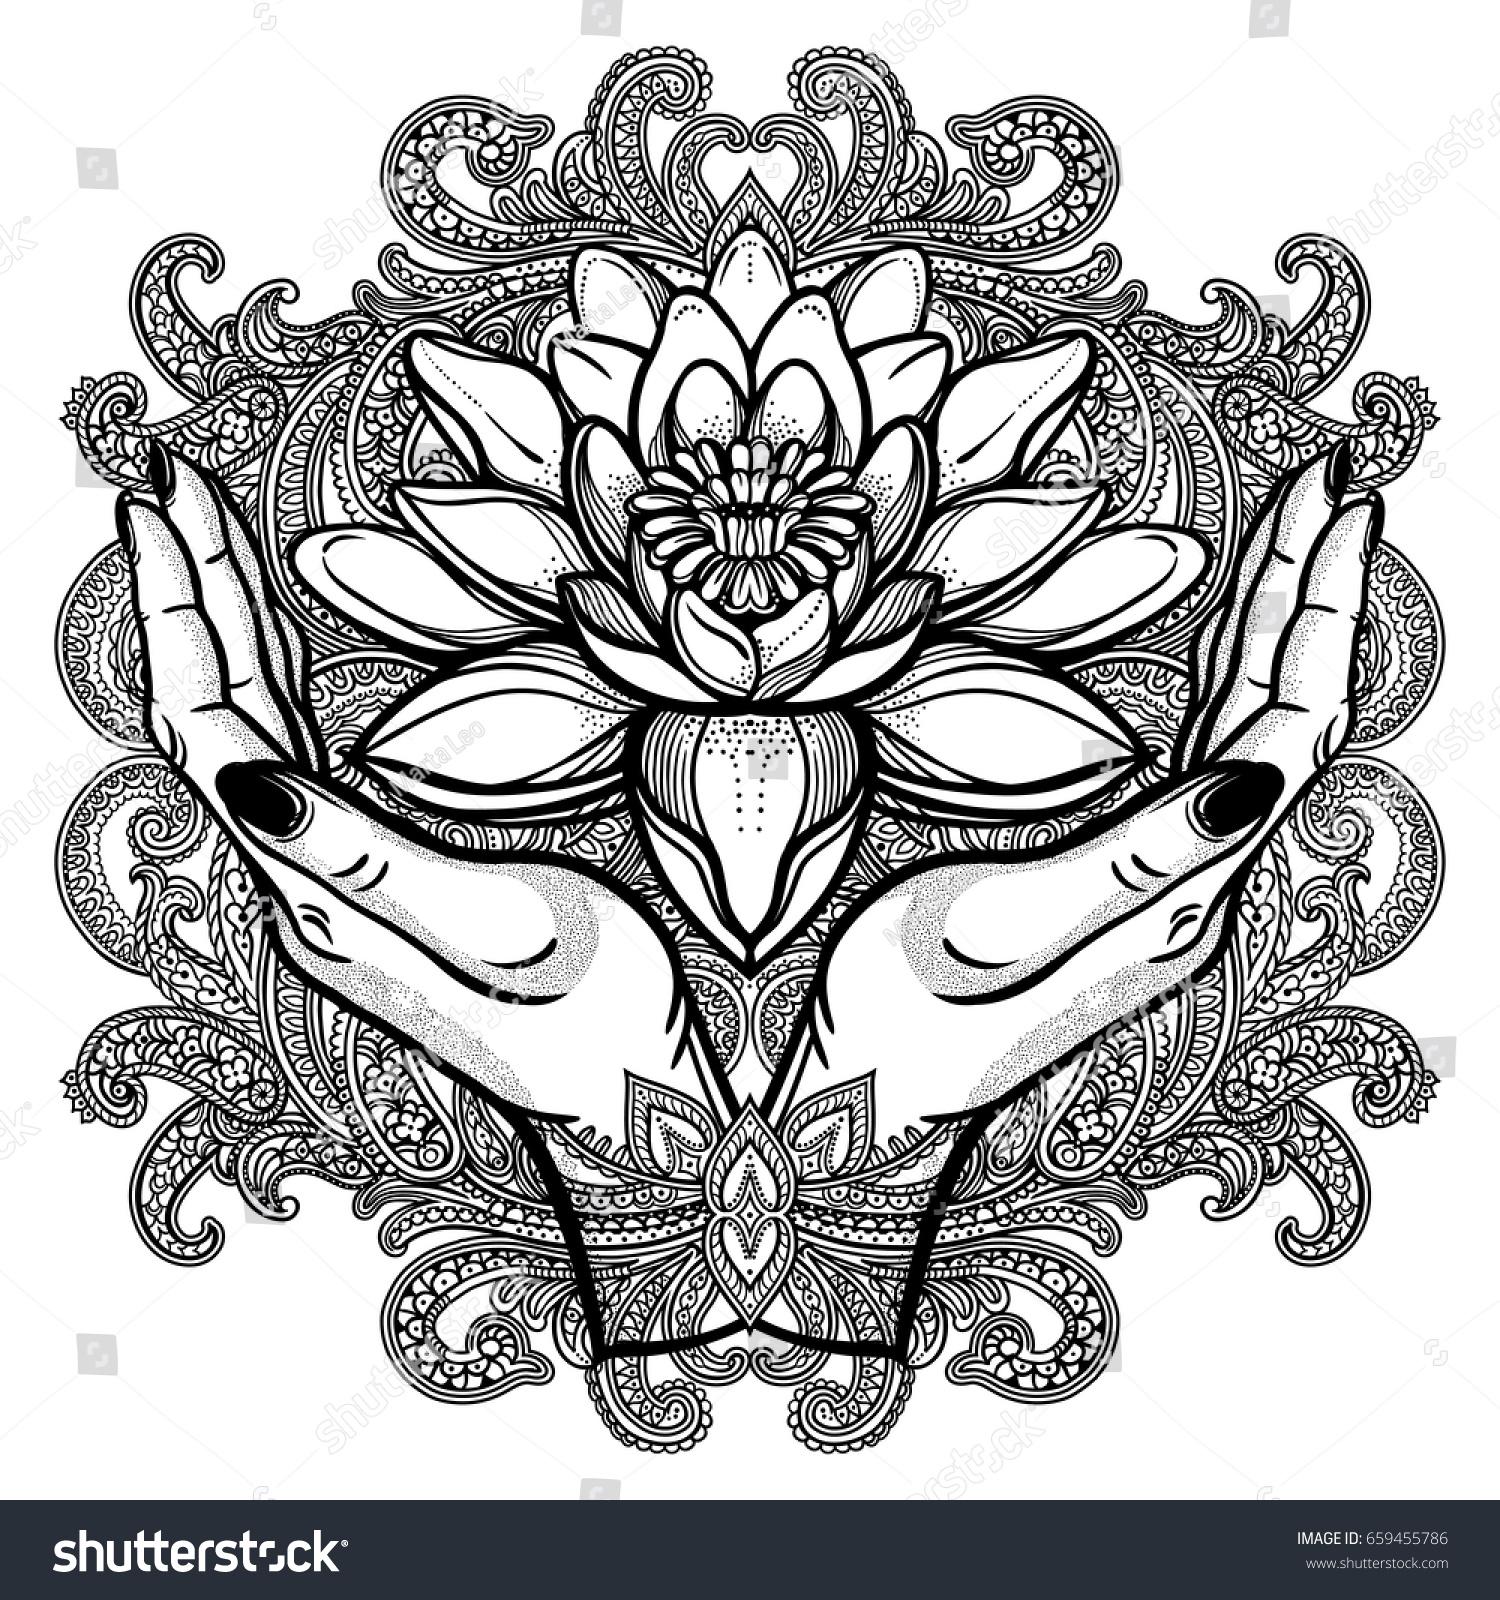 Hand drawn beautiful lotus flower hands stock vector royalty free hand drawn beautiful lotus flower in hands water lily motif spiritual art for tattoo mightylinksfo